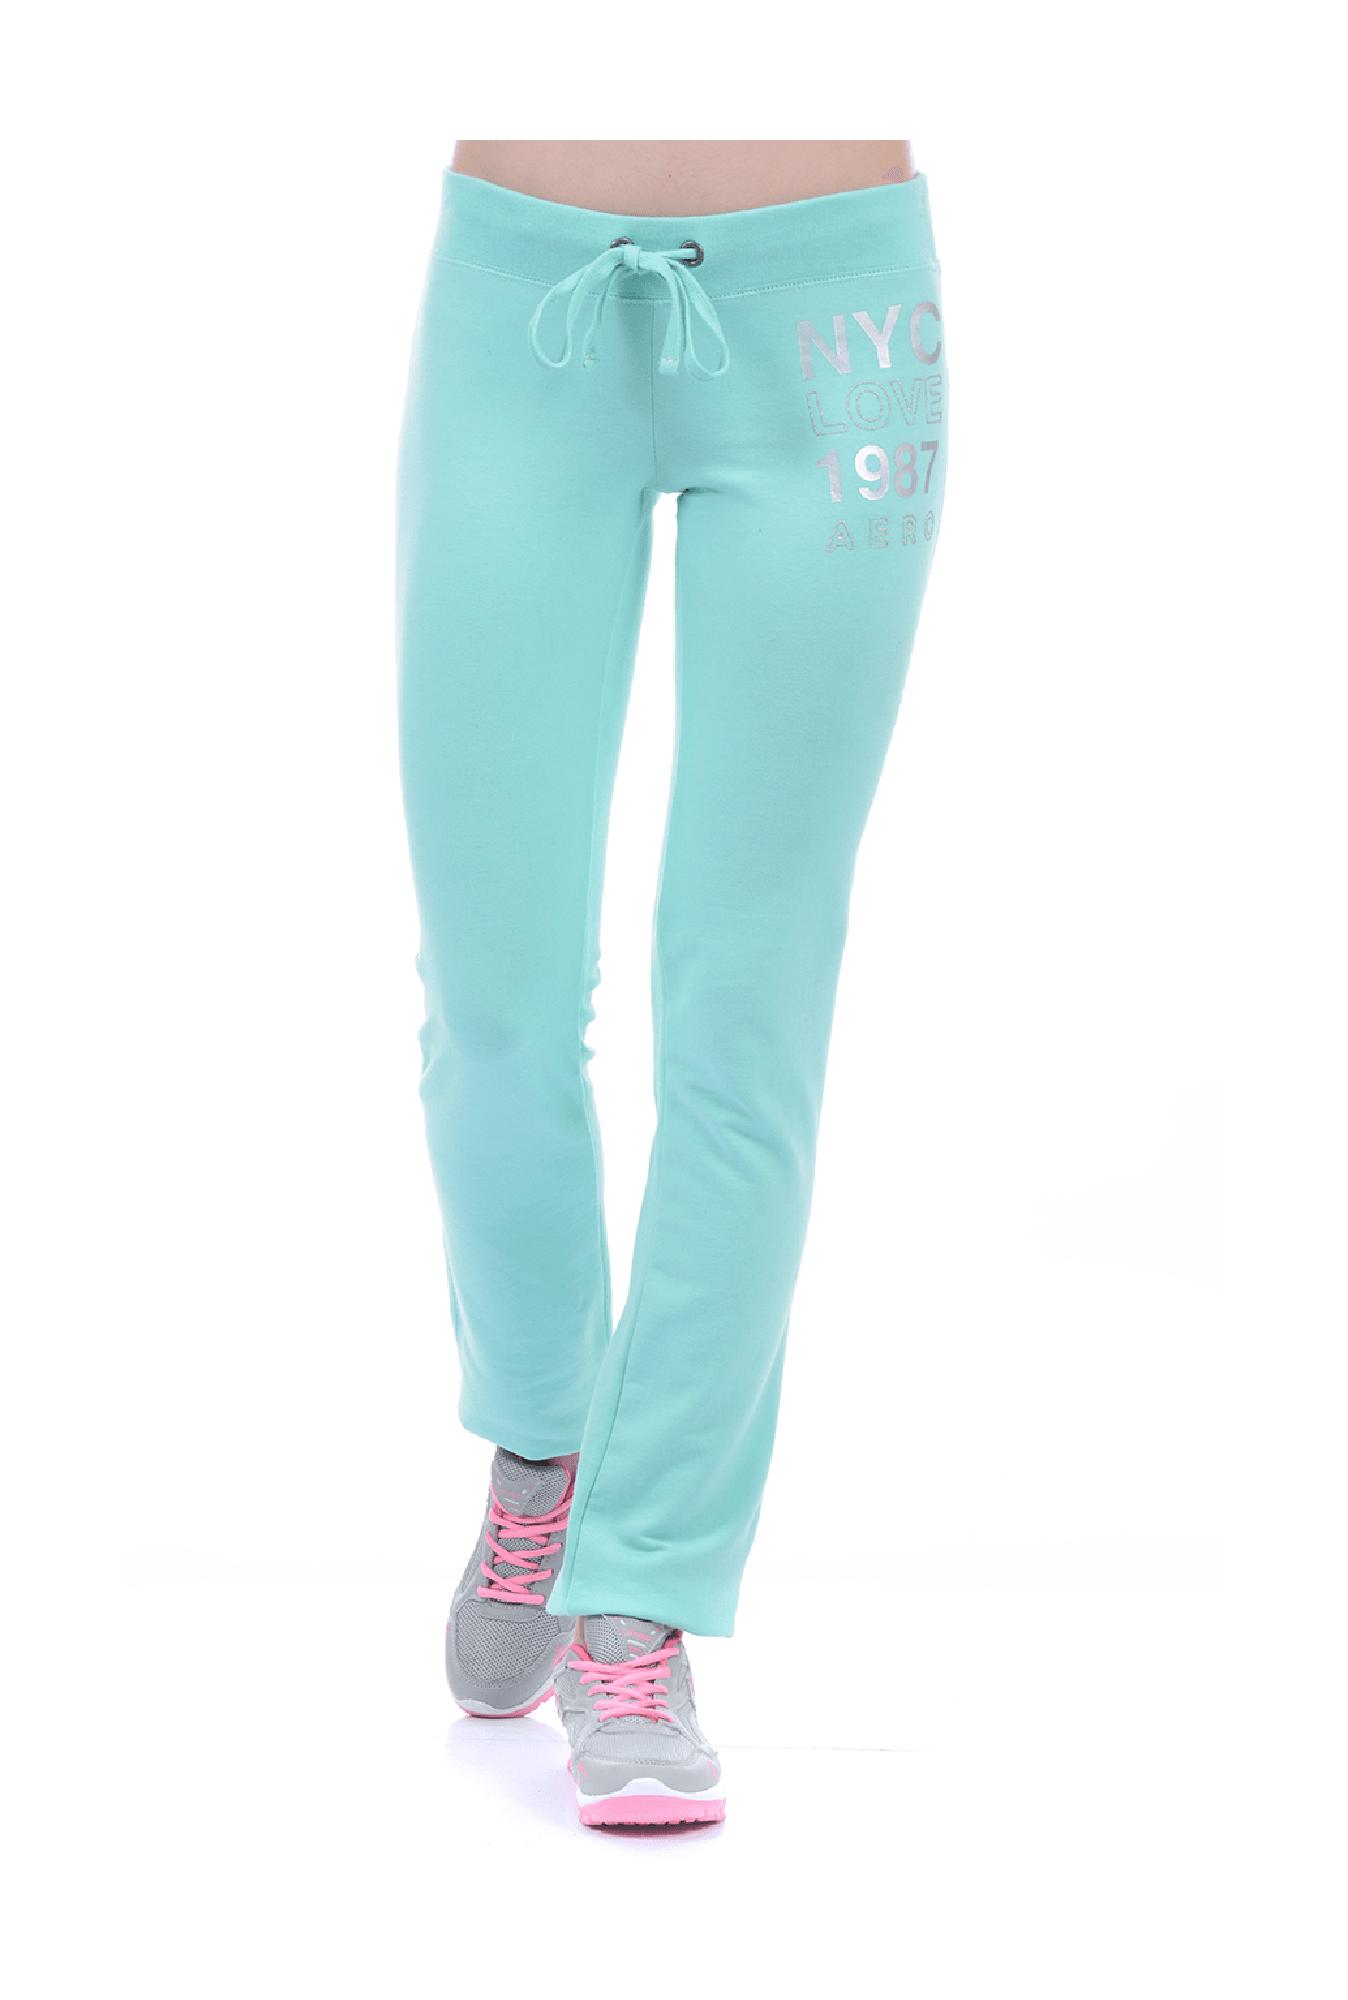 fba0ff5d8ac156 Buy Aeropostale Aqua Cotton Slim Fit Leggings for Women Online ...